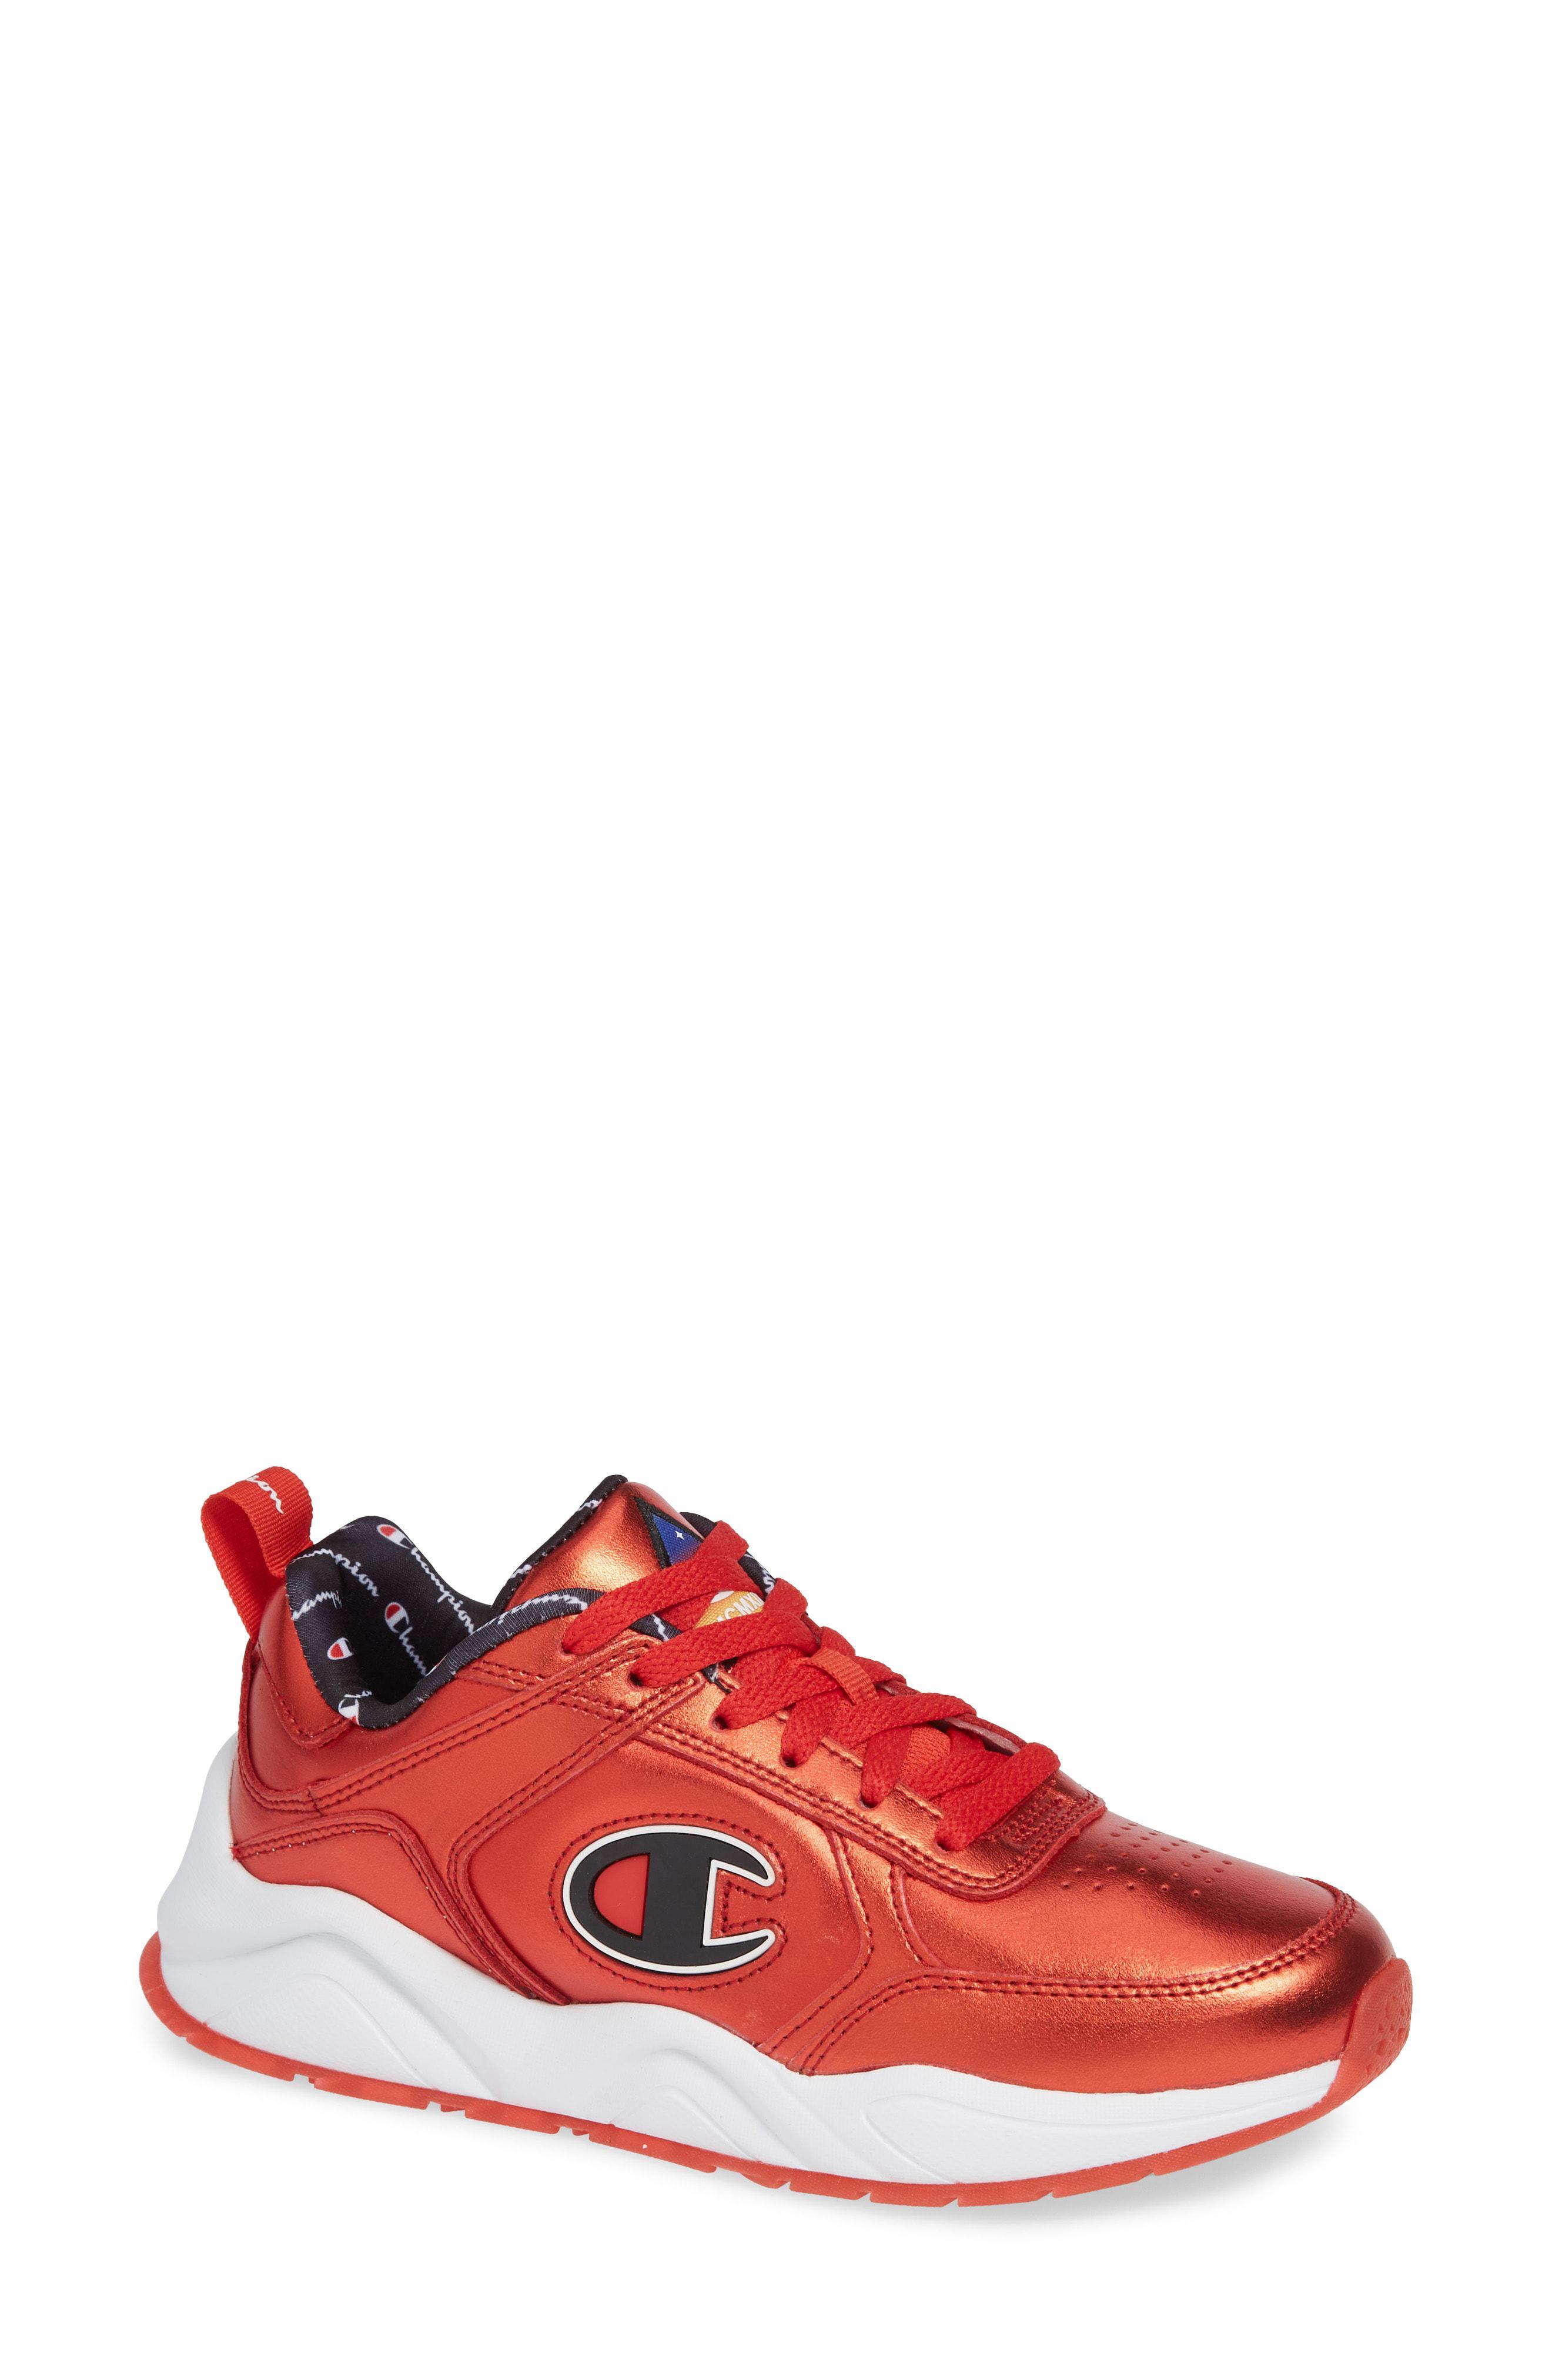 fafc7a8f7b7 Lyst - Champion 93 Eighteen Metallic Sneaker in Red